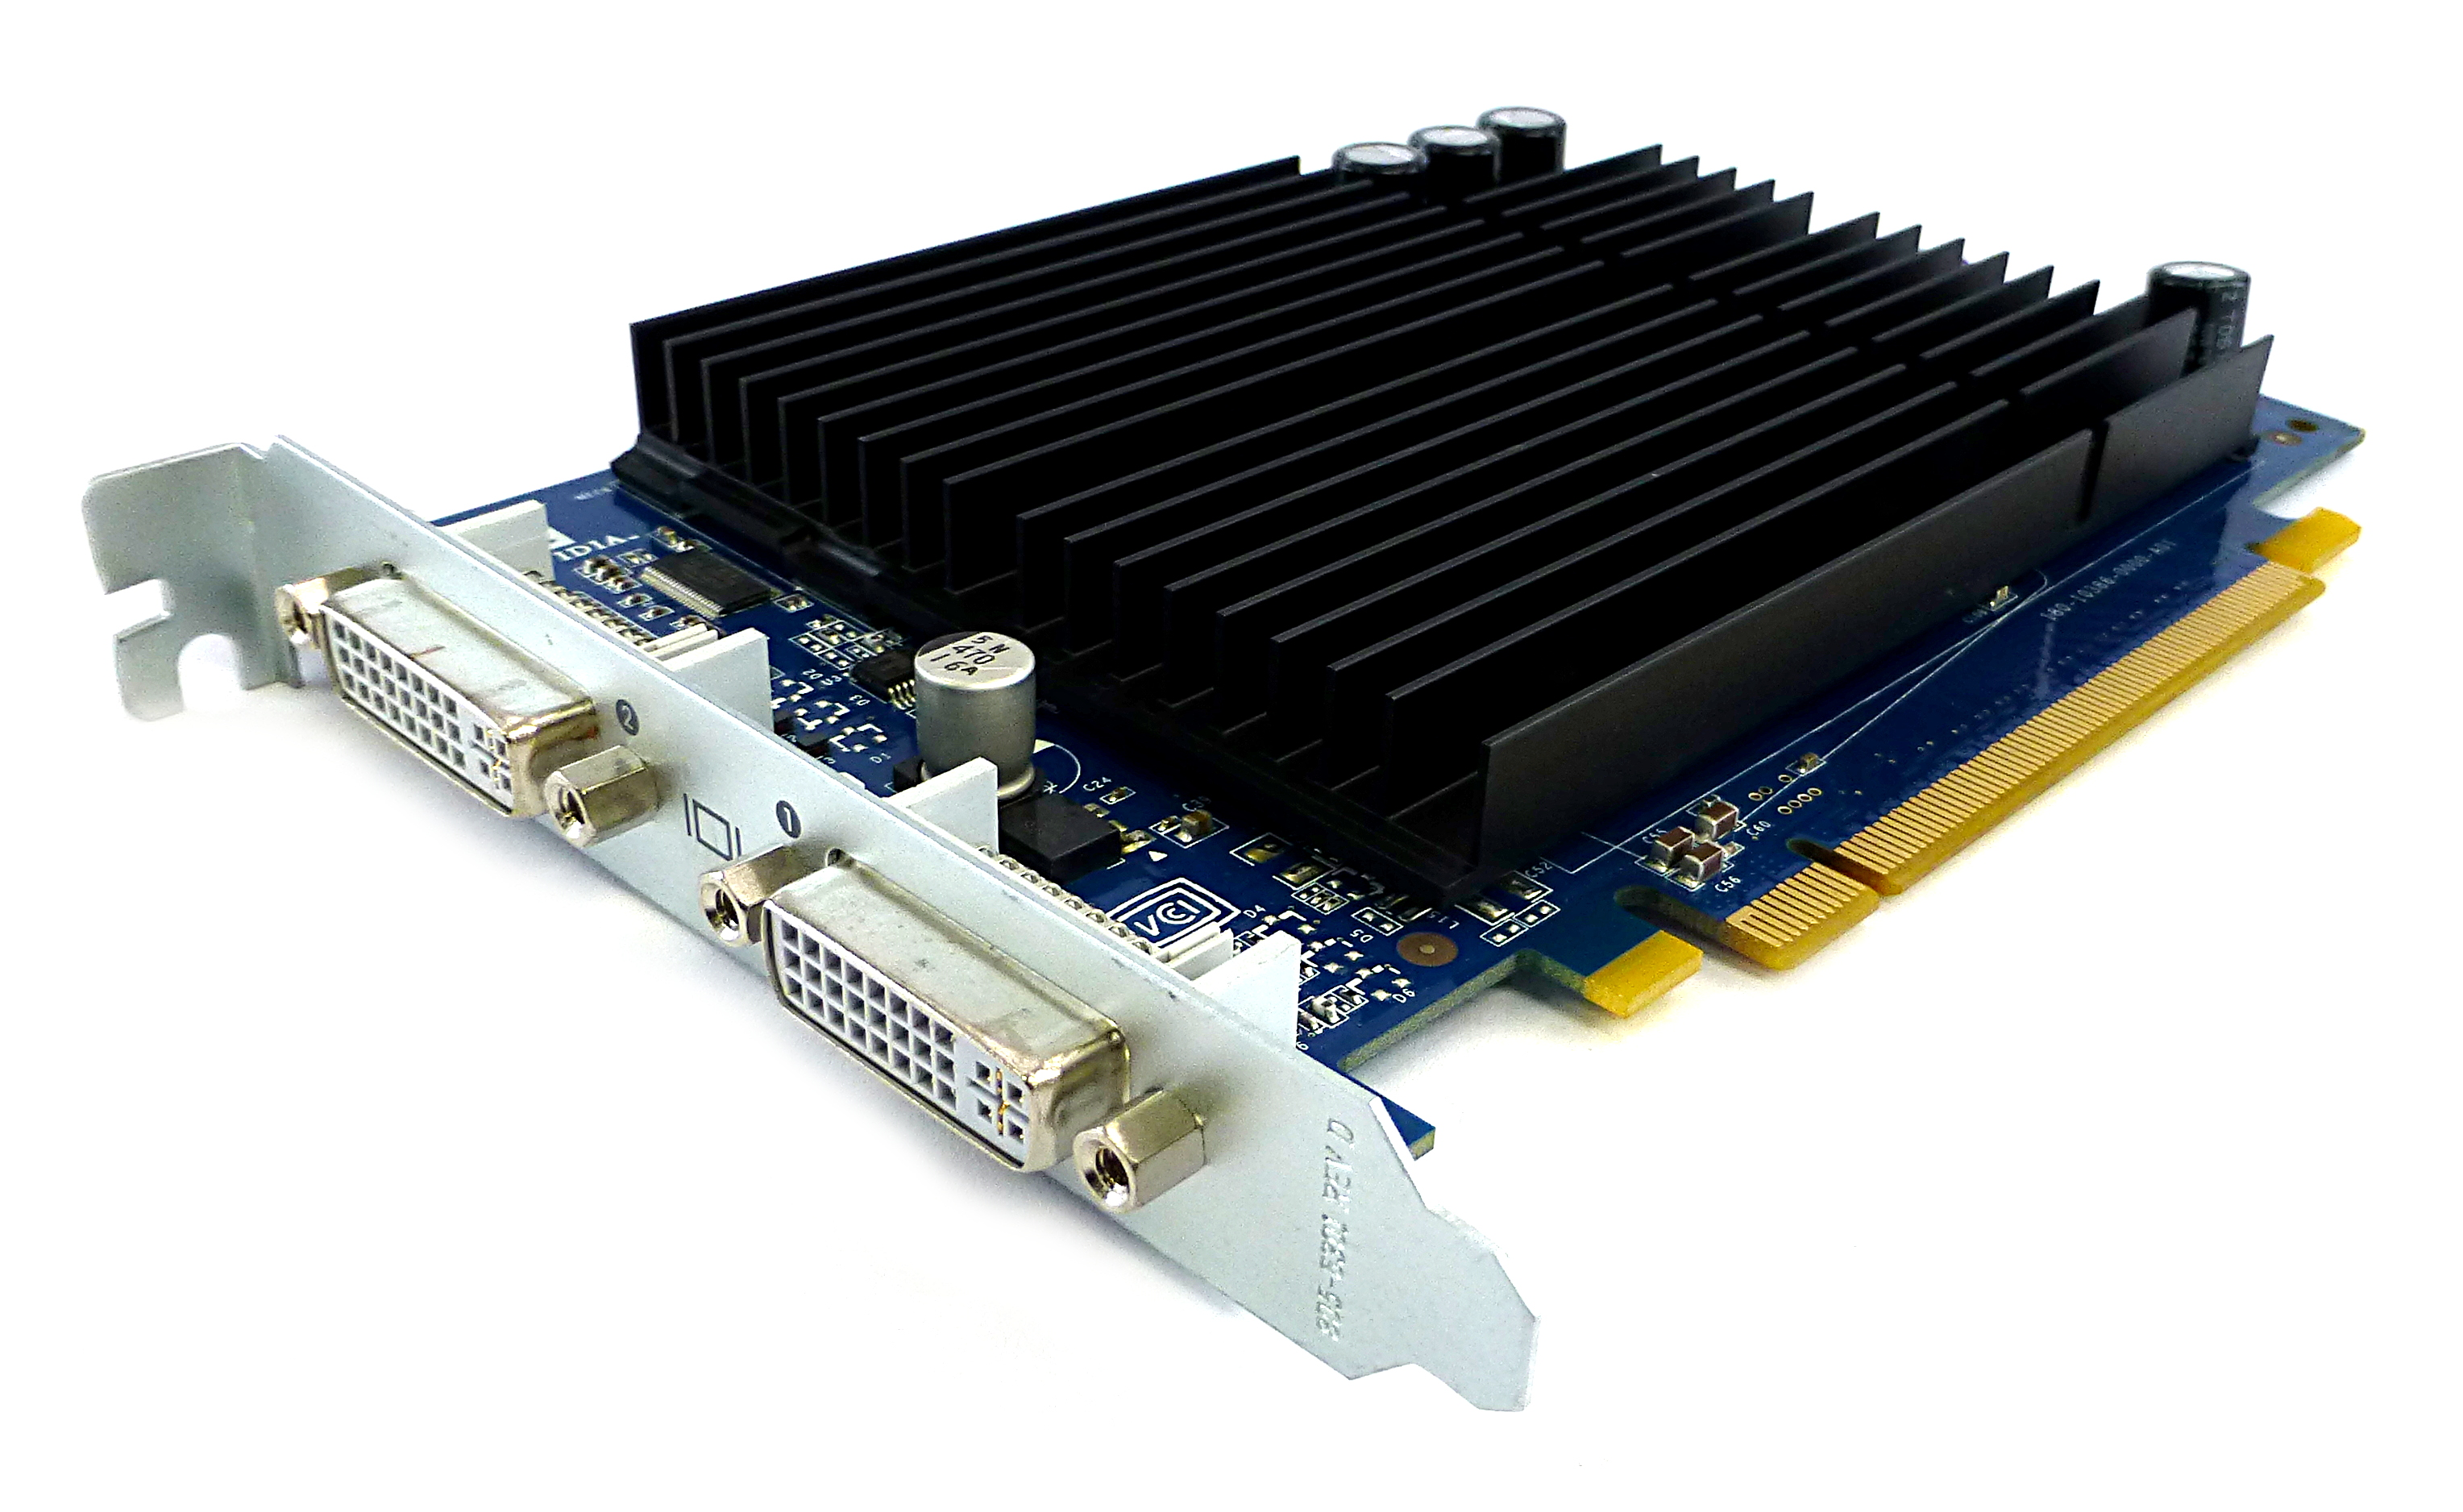 630-6978 Apple Power Mac G5 Nvidia:A386 256MB PCI-E Dual DVI Graphics Card